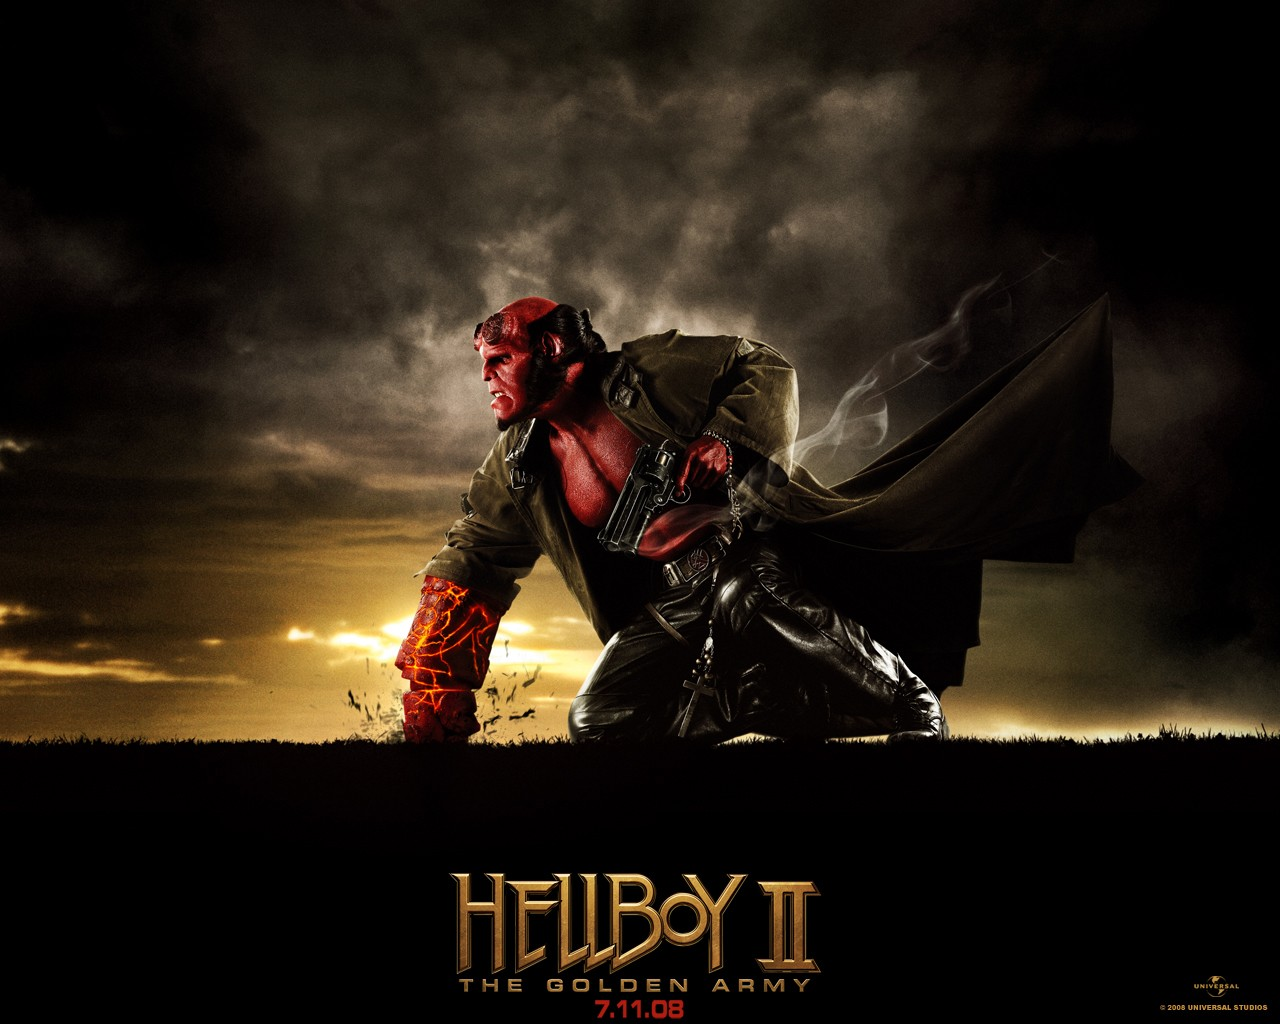 Un wallpaper di Ron Perlman (Hellboy) nel film di 'Hellboy II - The Golden Army'